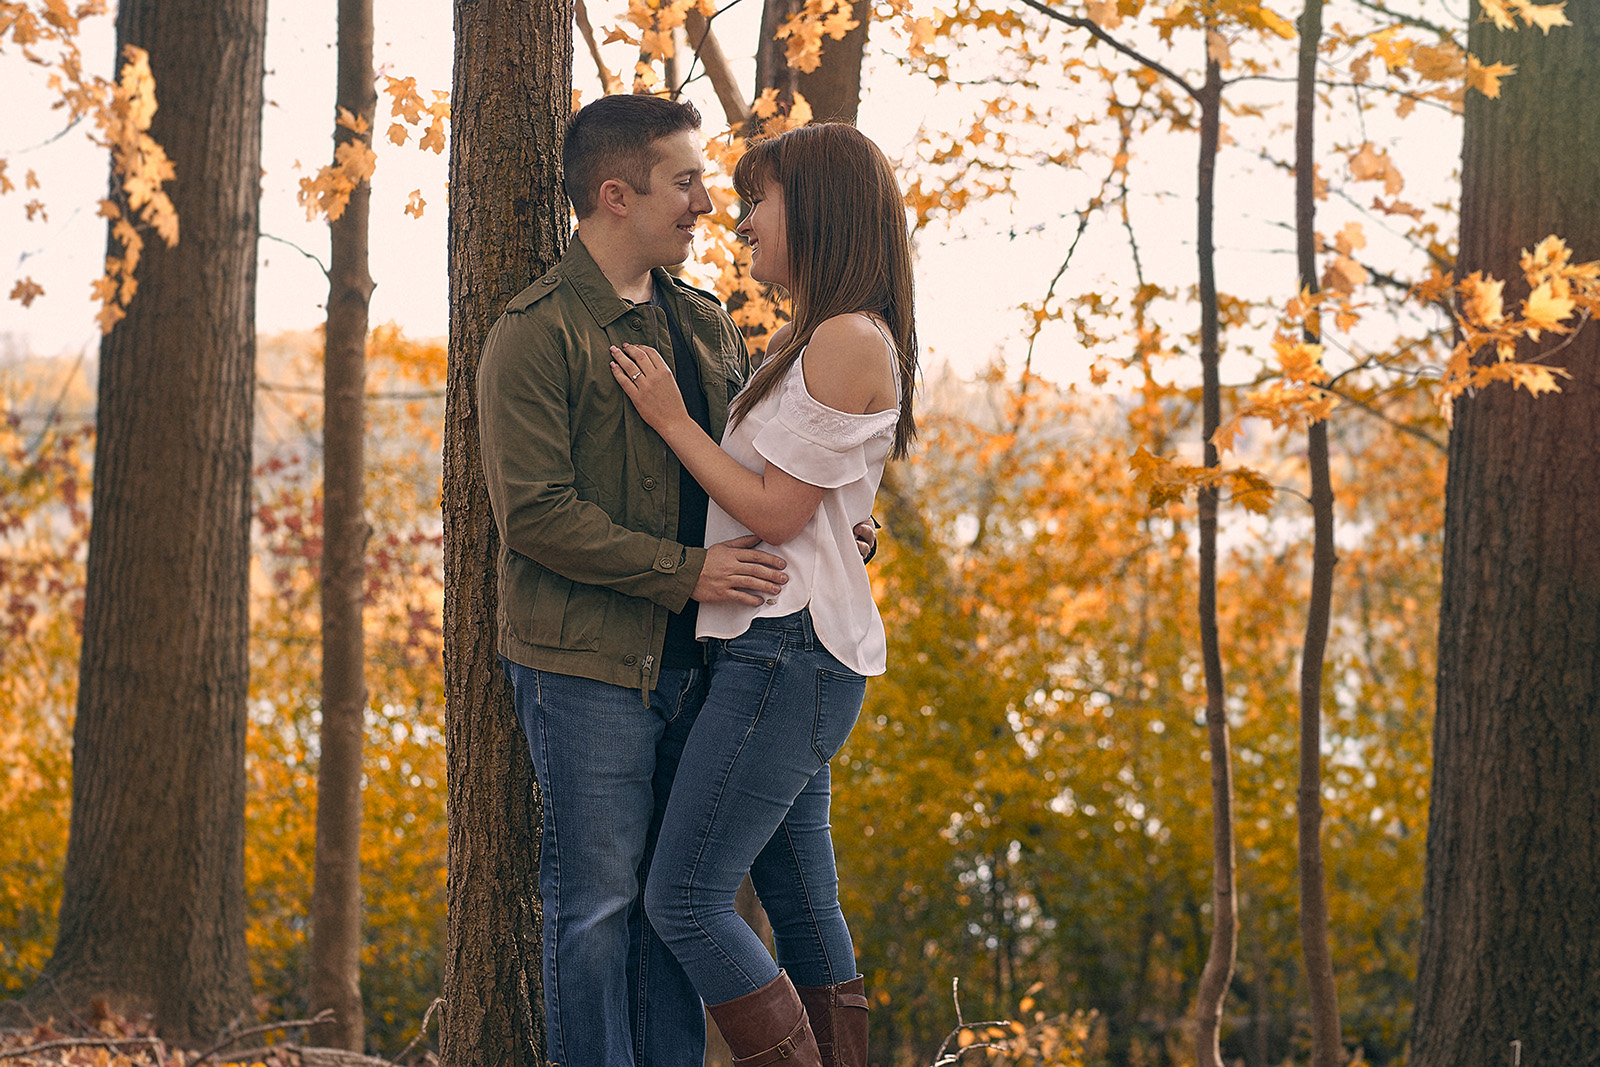 Mike_Mendez_Photography_Wedding_Engagements_14